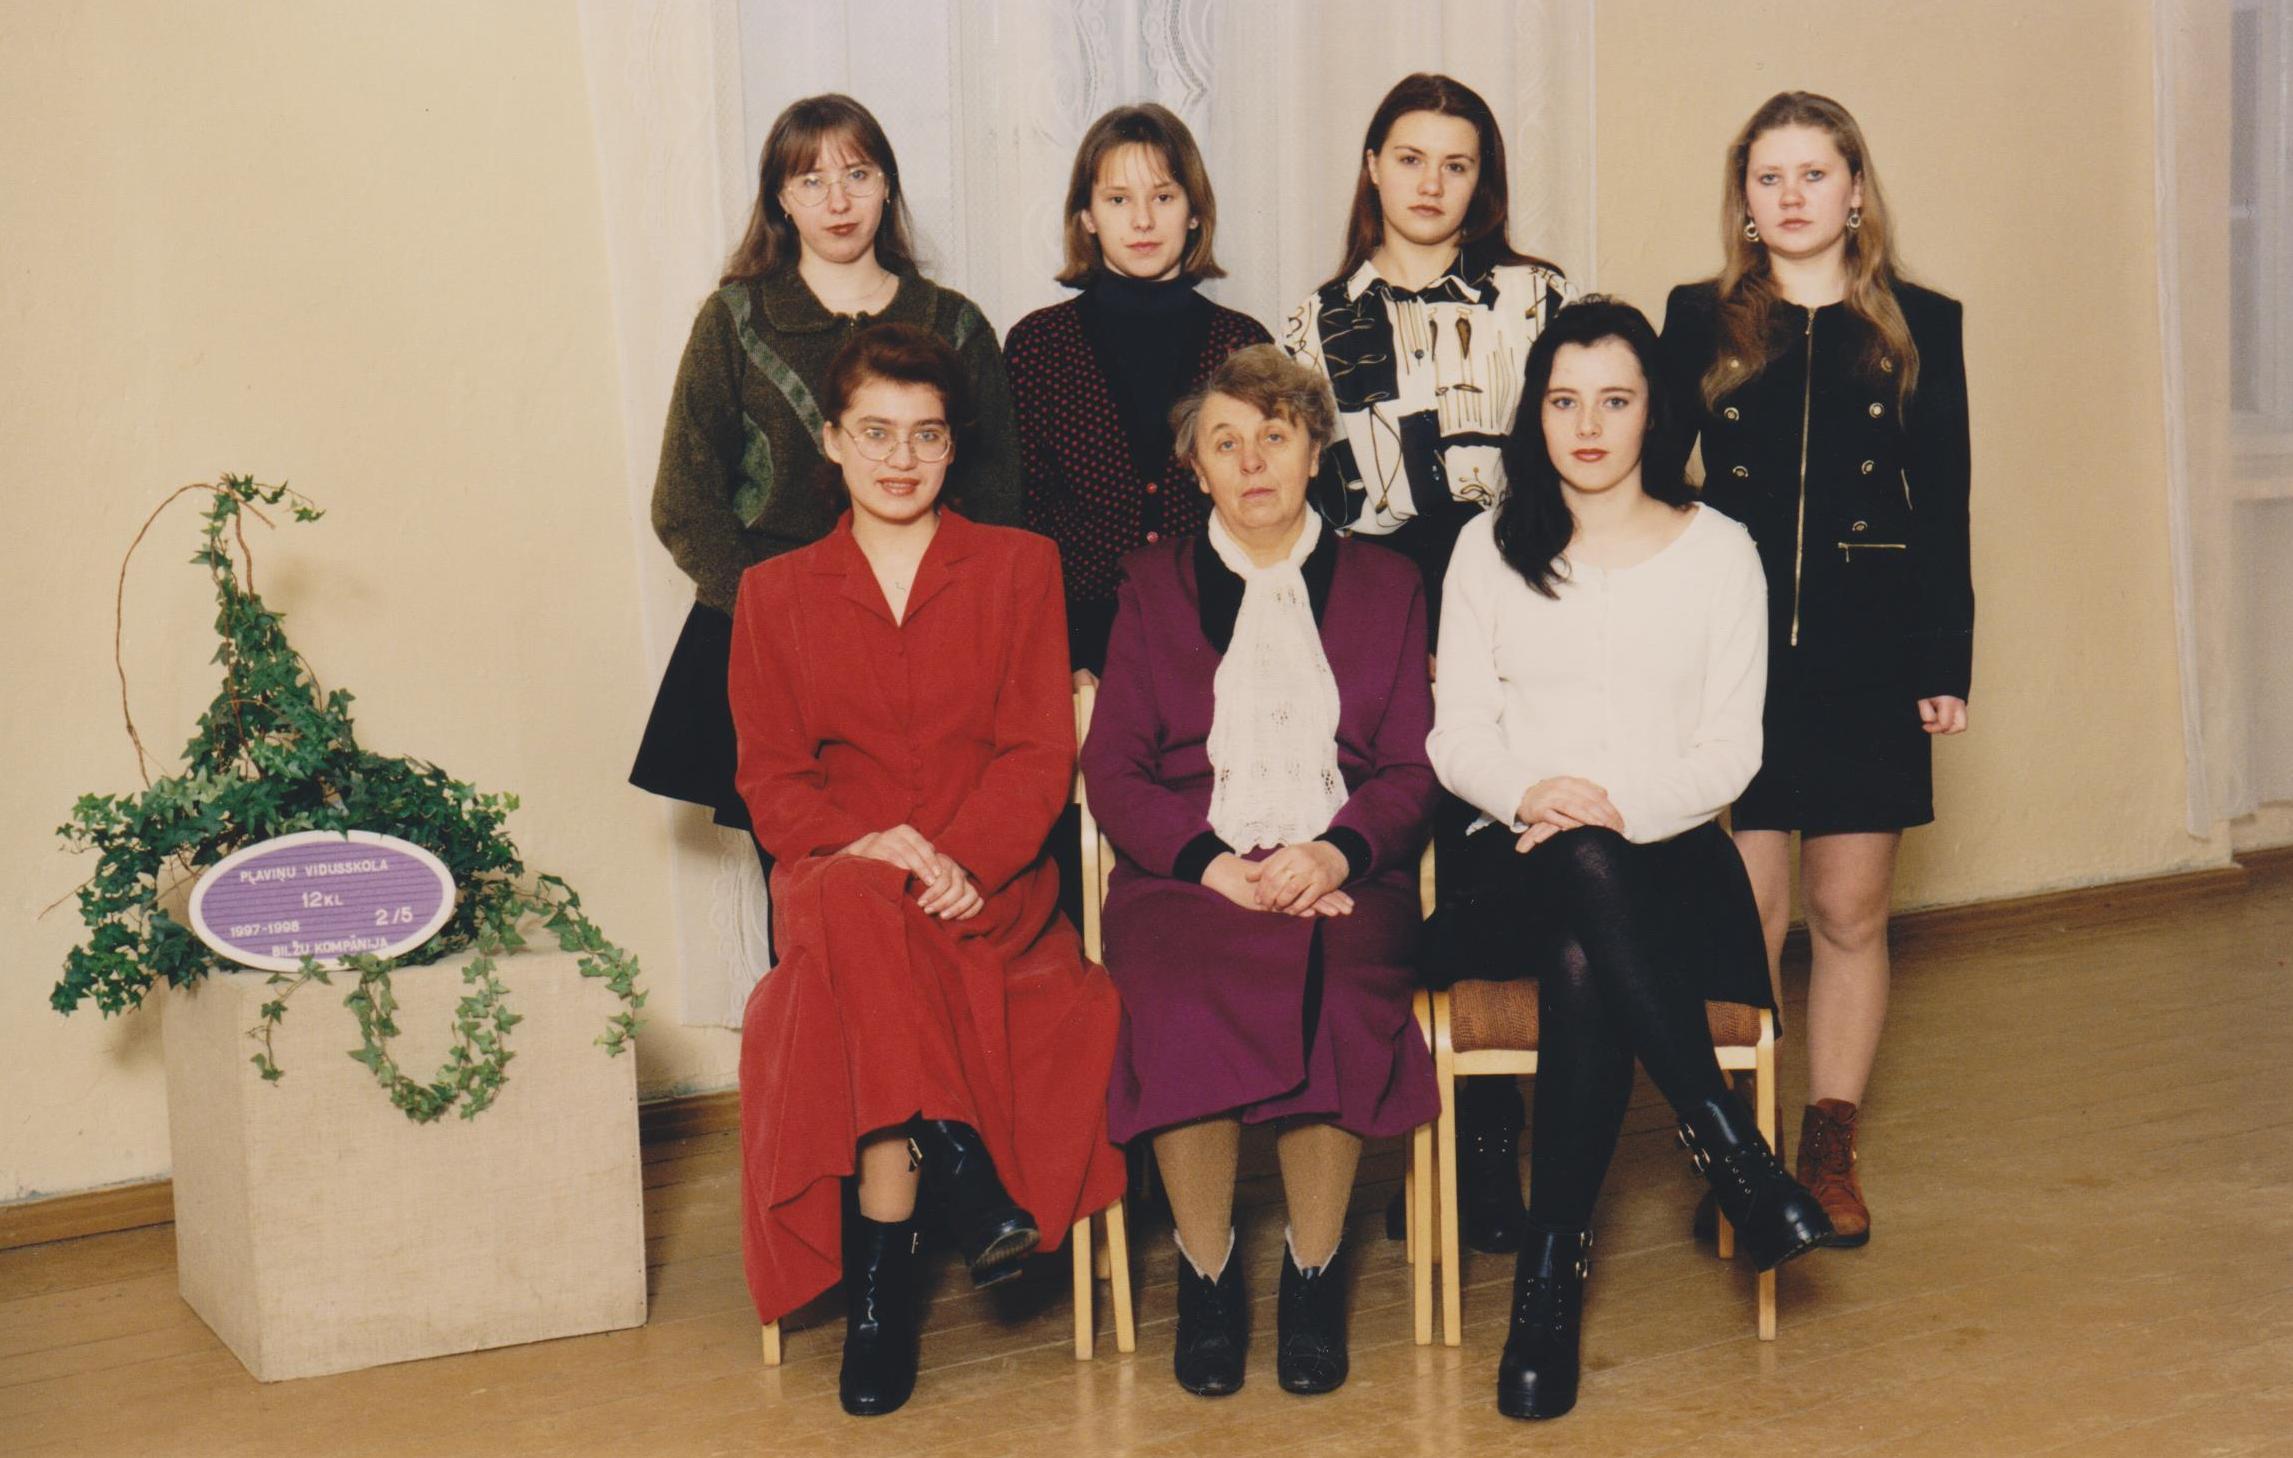 1998.gads audz. Ludmila Artemjeva